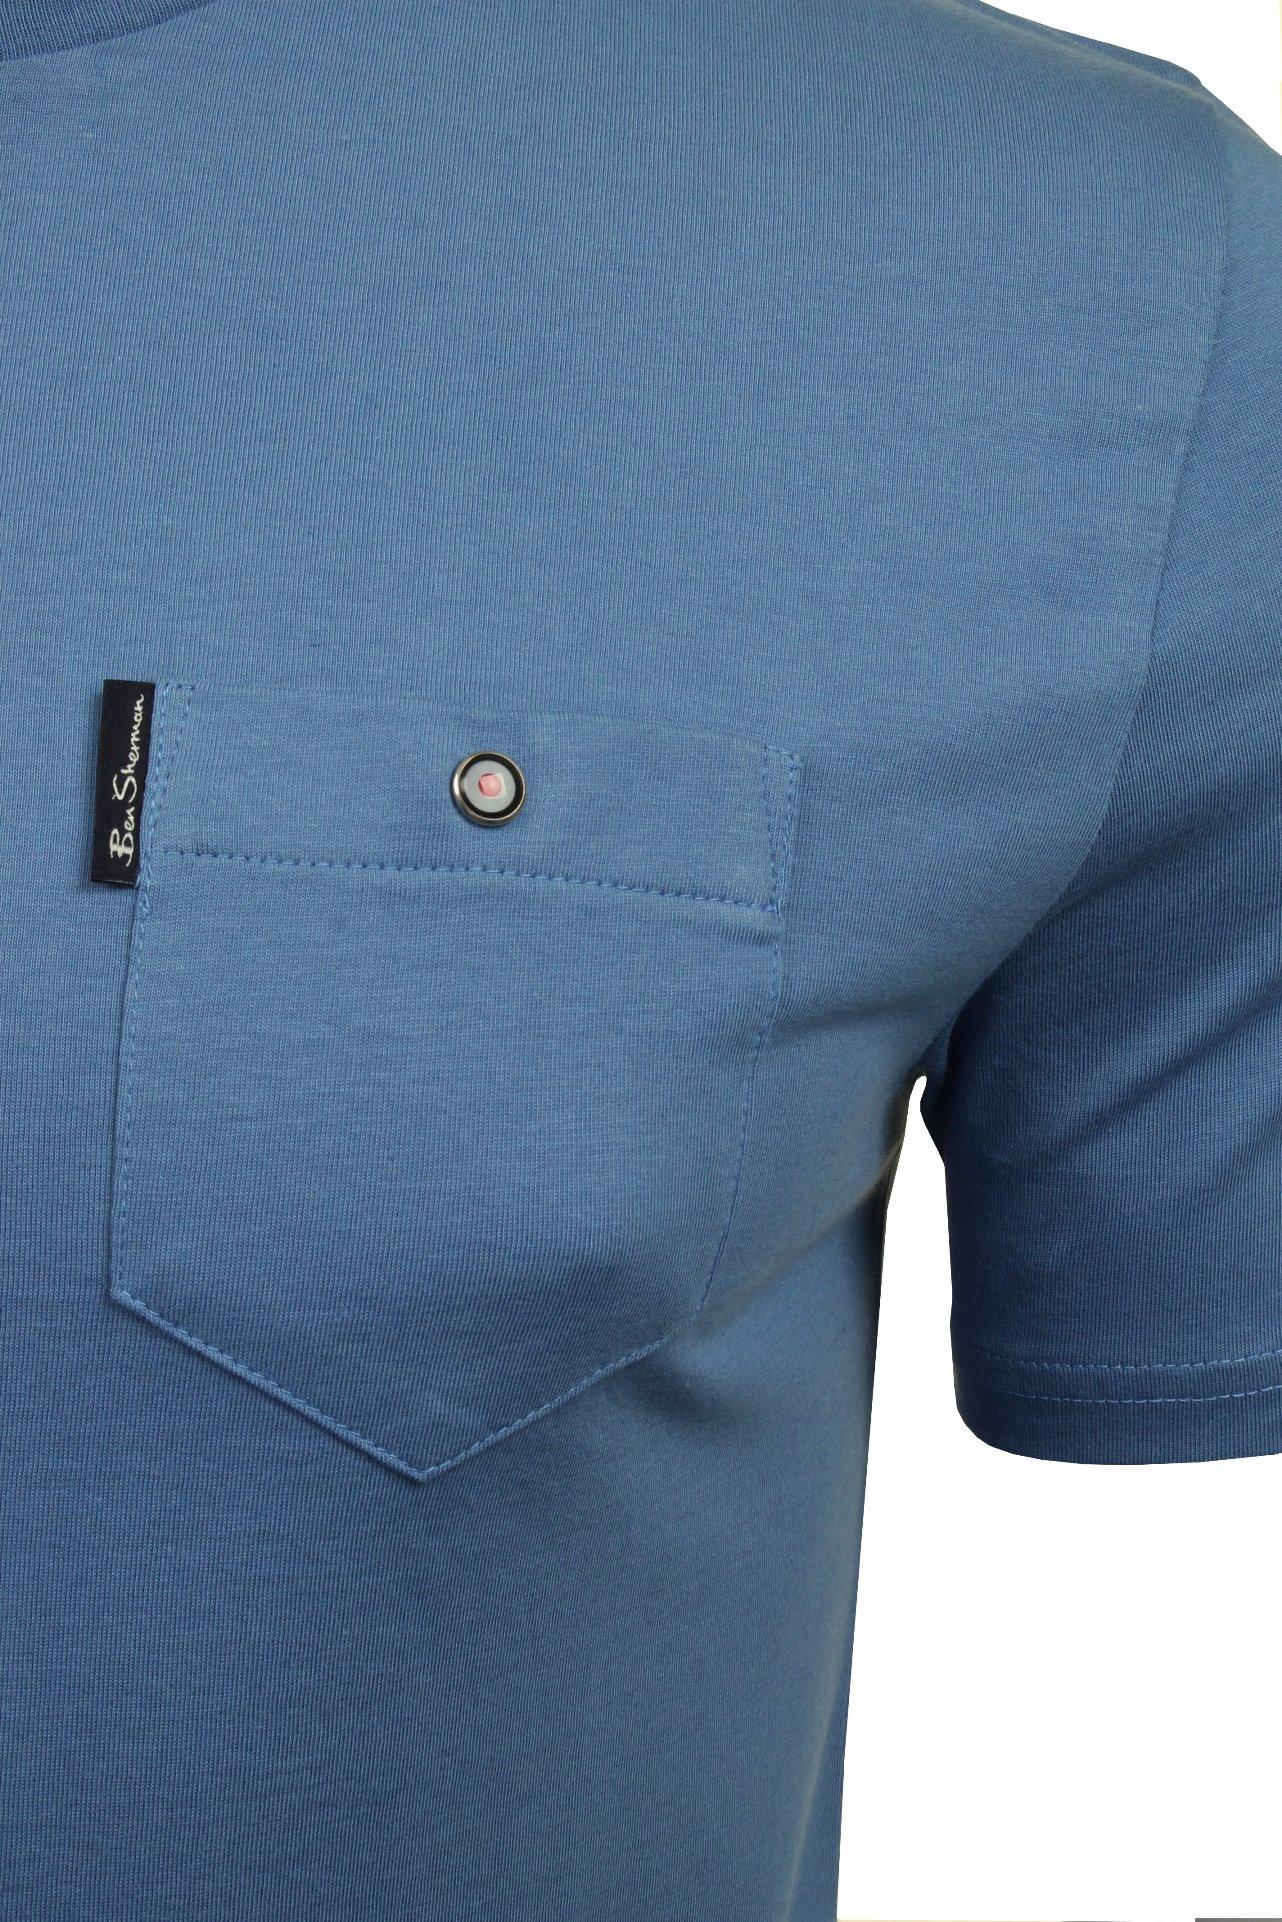 Mens-Classic-Spade-Pocket-T-Shirt-by-Ben-Sherman thumbnail 12